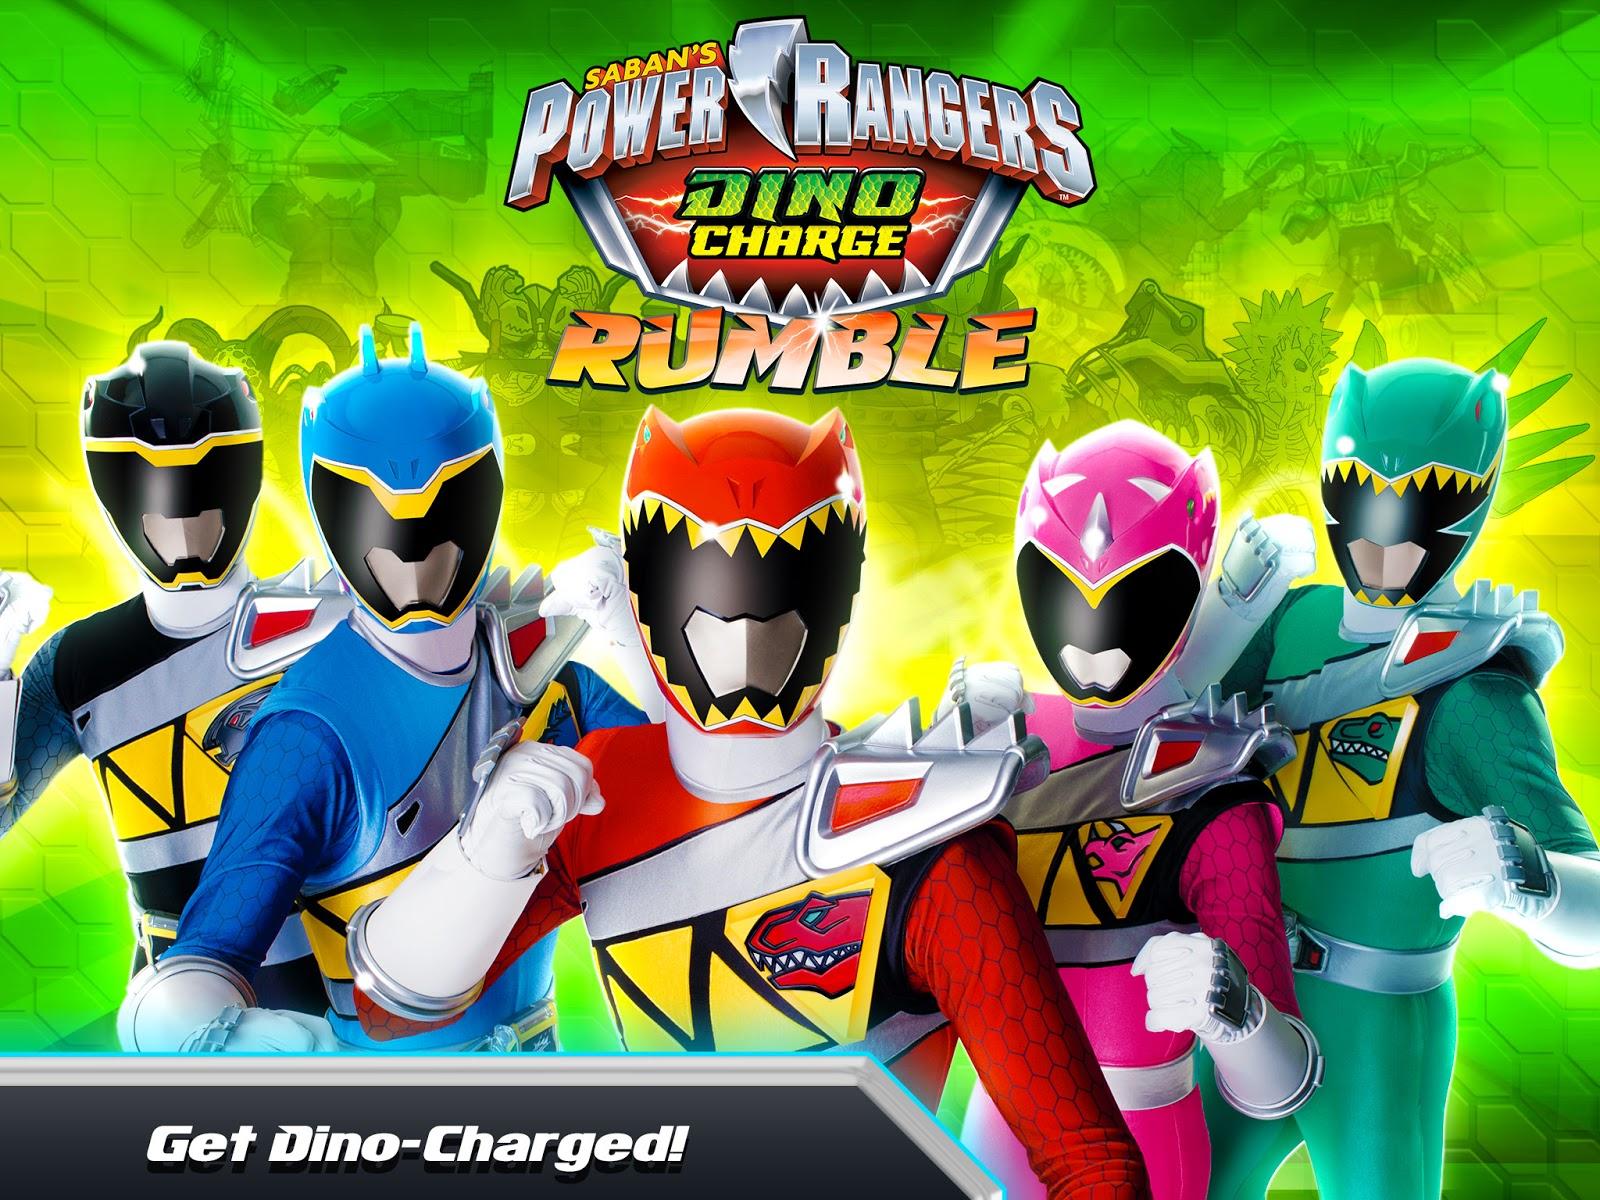 Henshin Grid Power Rangers Dino Charge Rumble App Game